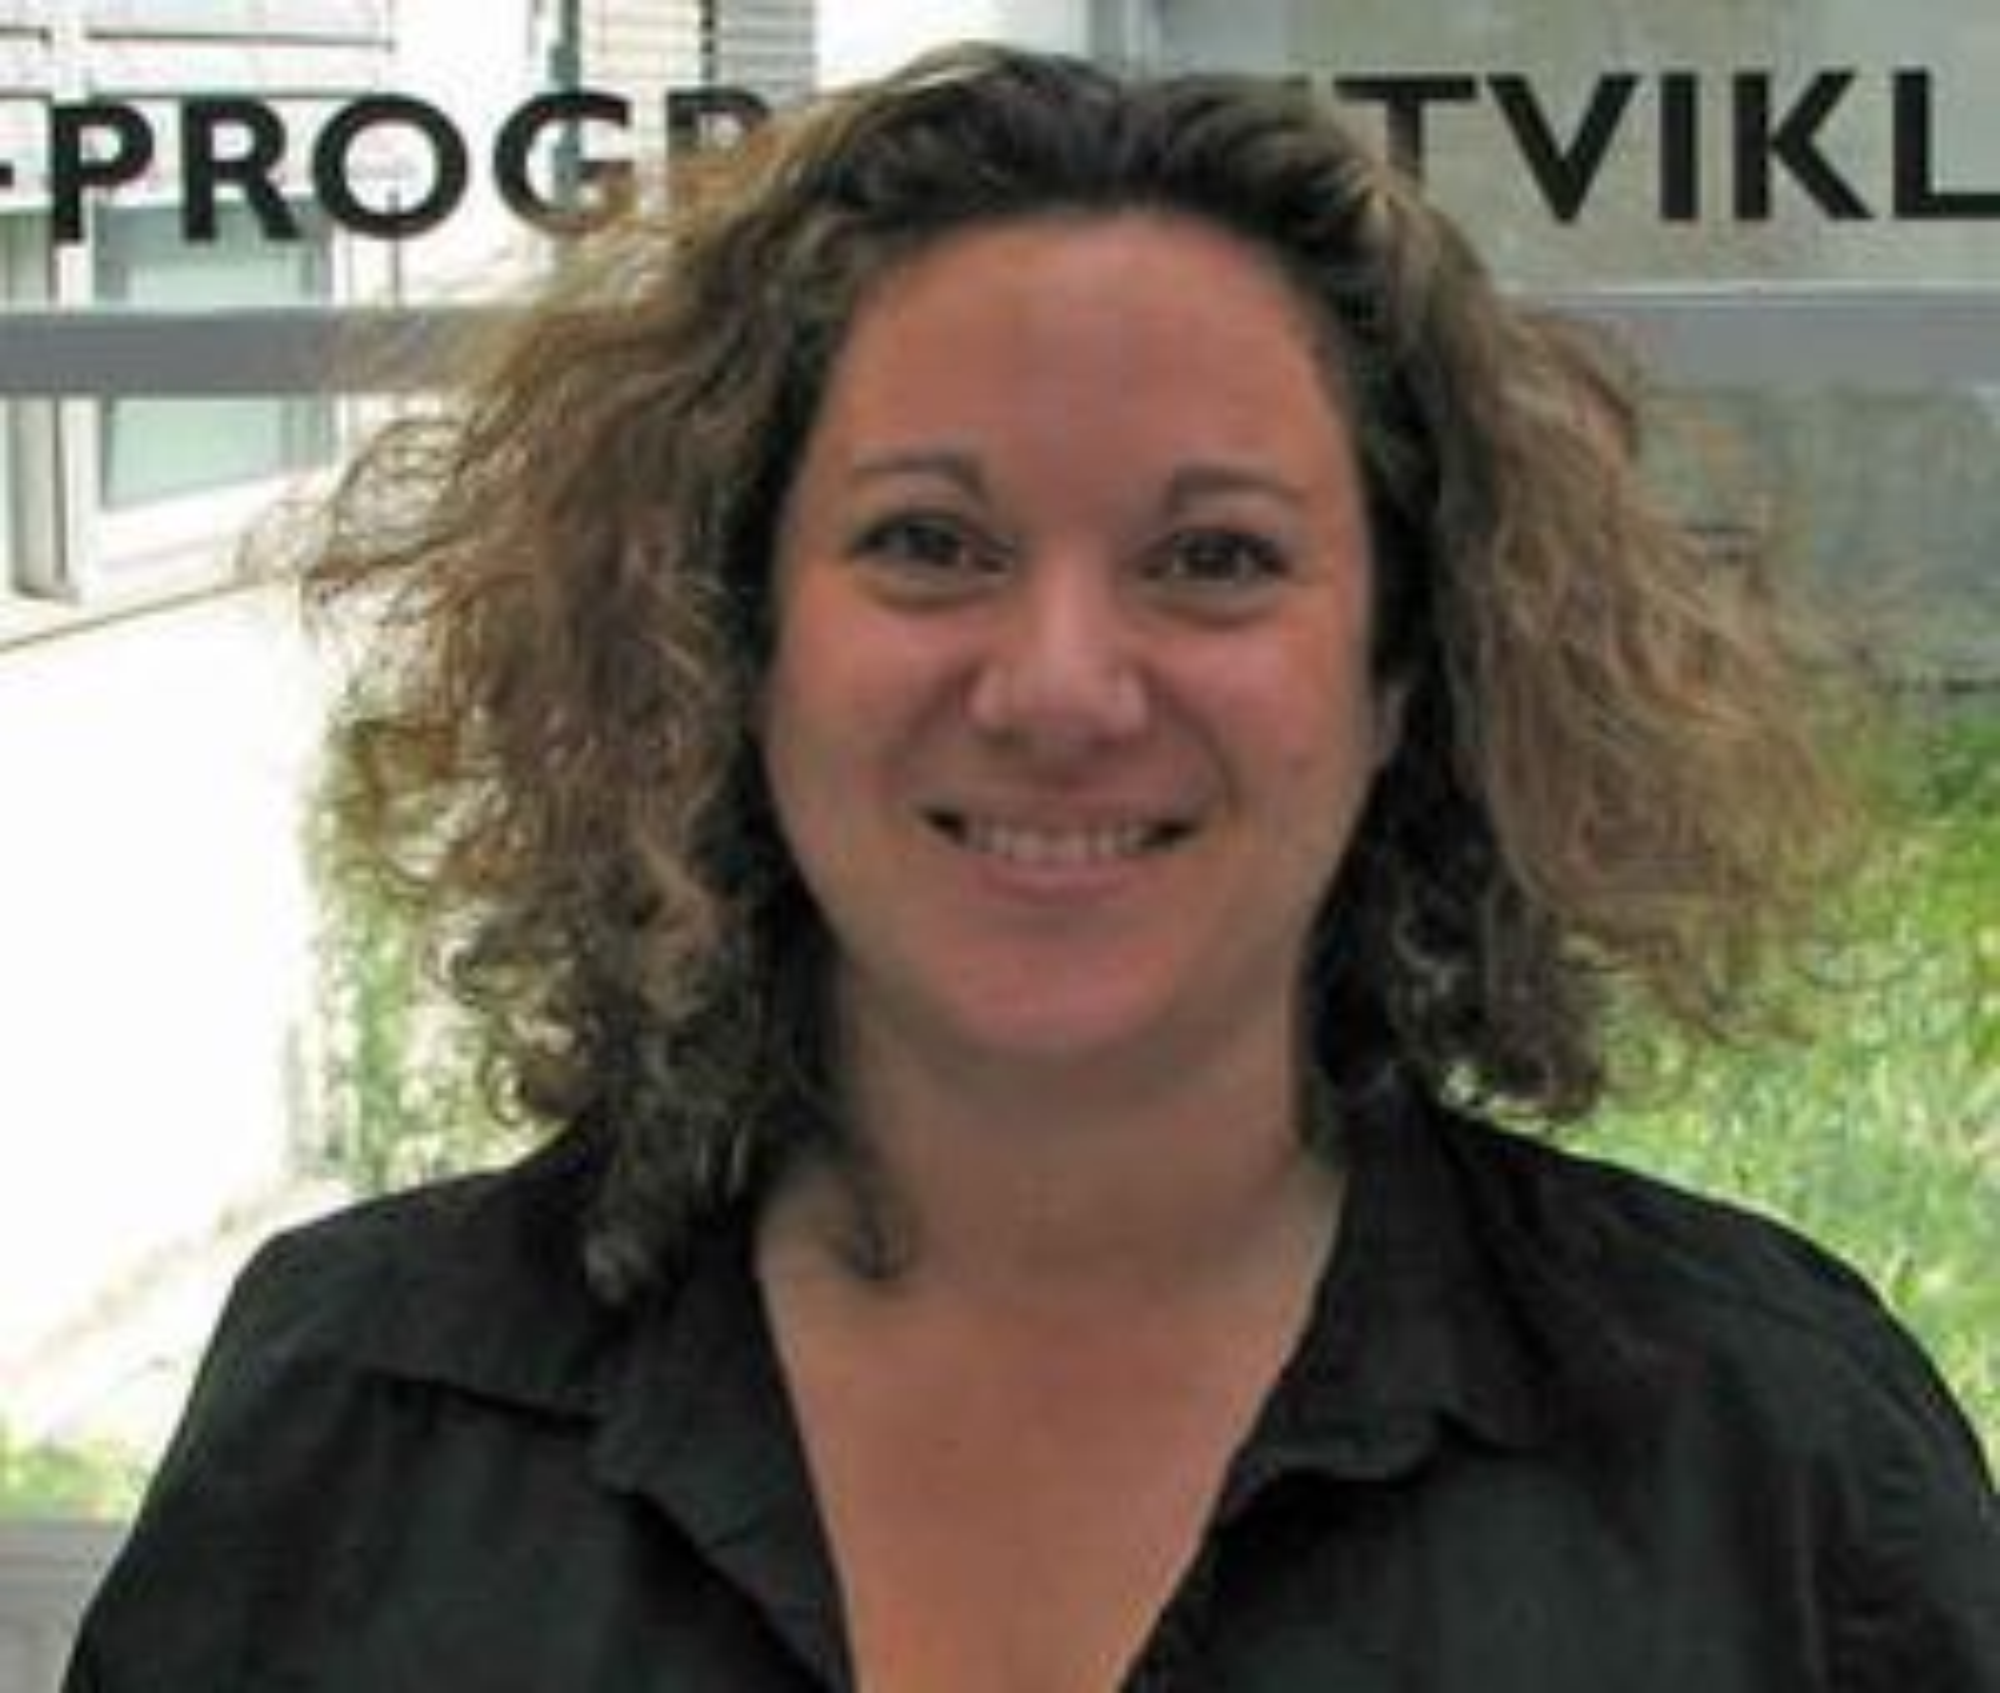 Jessica Hildrum, administrerende direktør i Programutvikling.